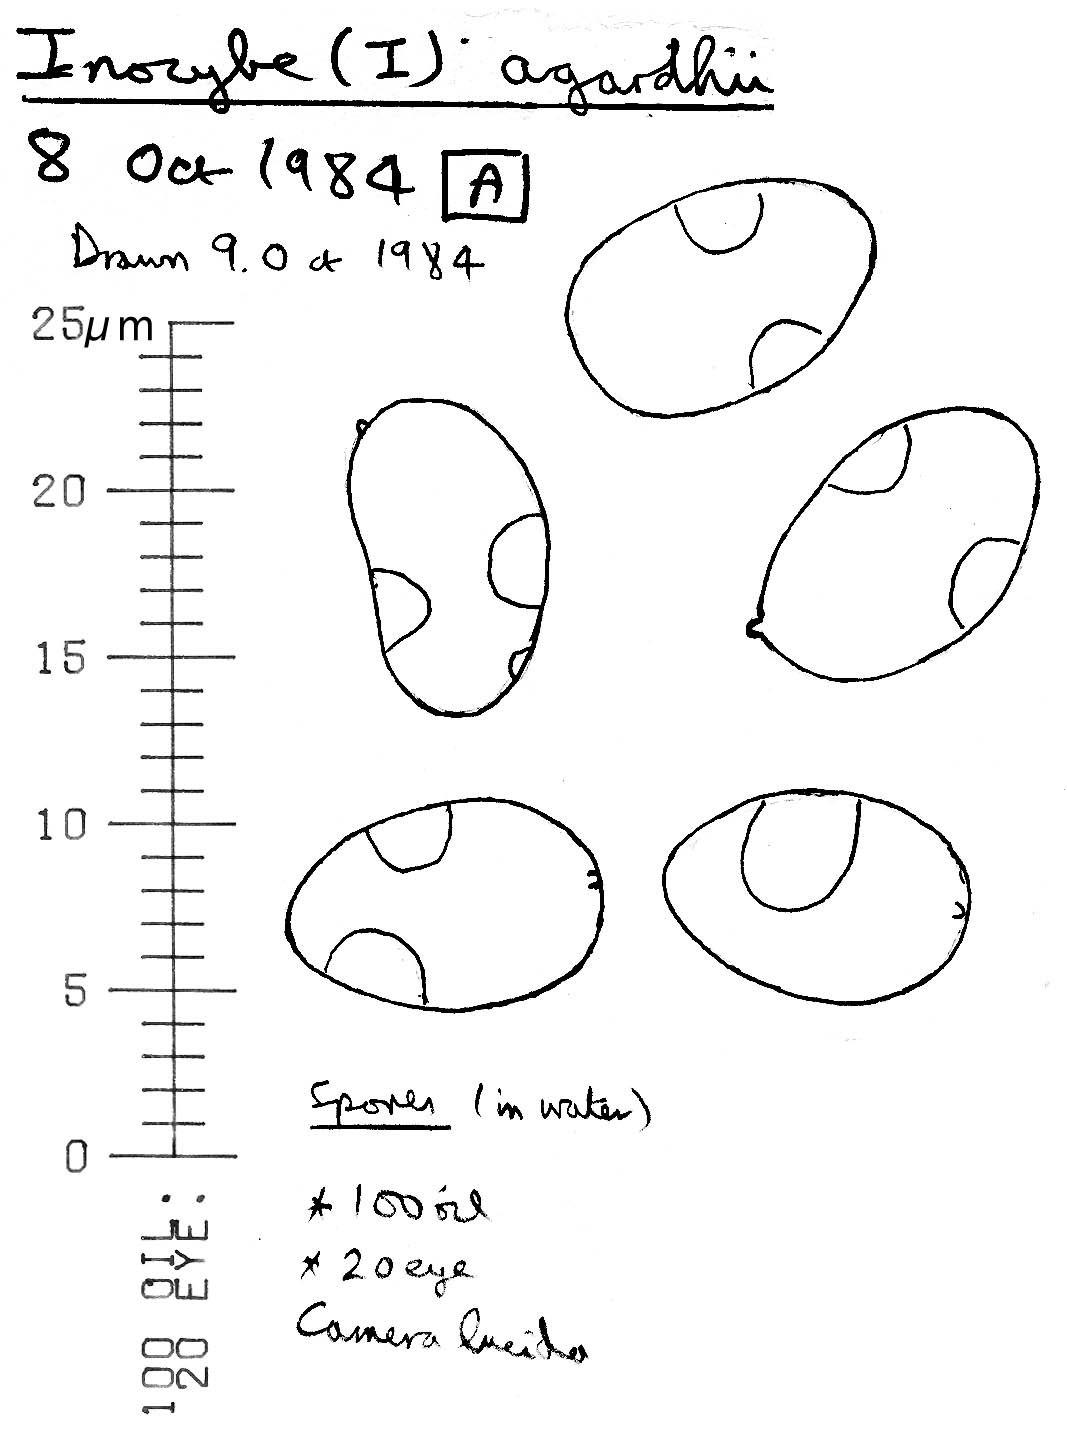 Image of <i>Inocybe agardhii</i> (N. Lund) P. D. Orton 1960